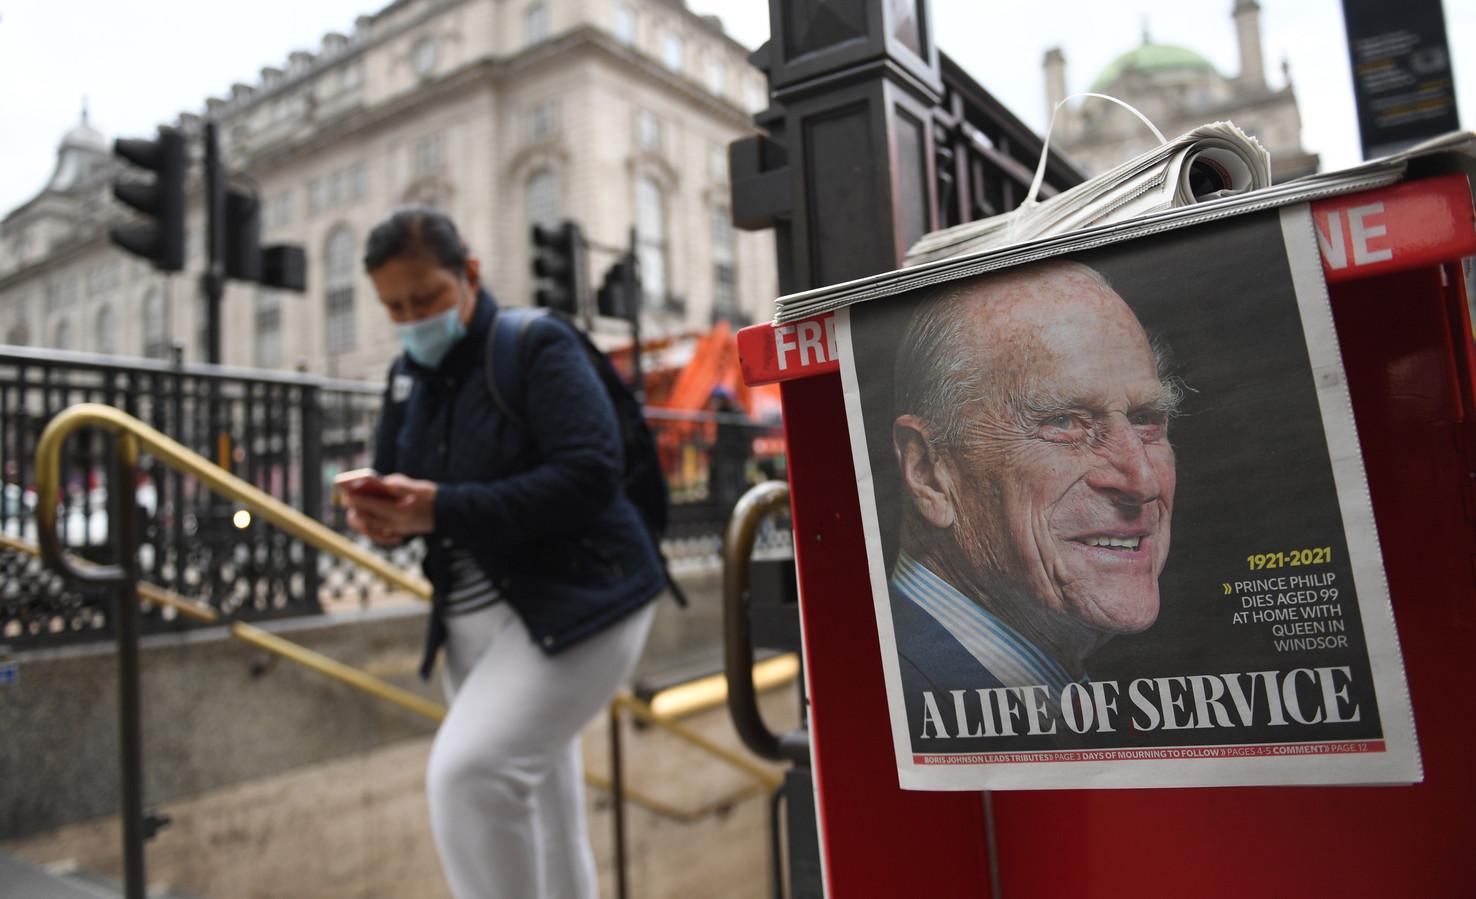 La presse britannique rend hommage au prince Philip.